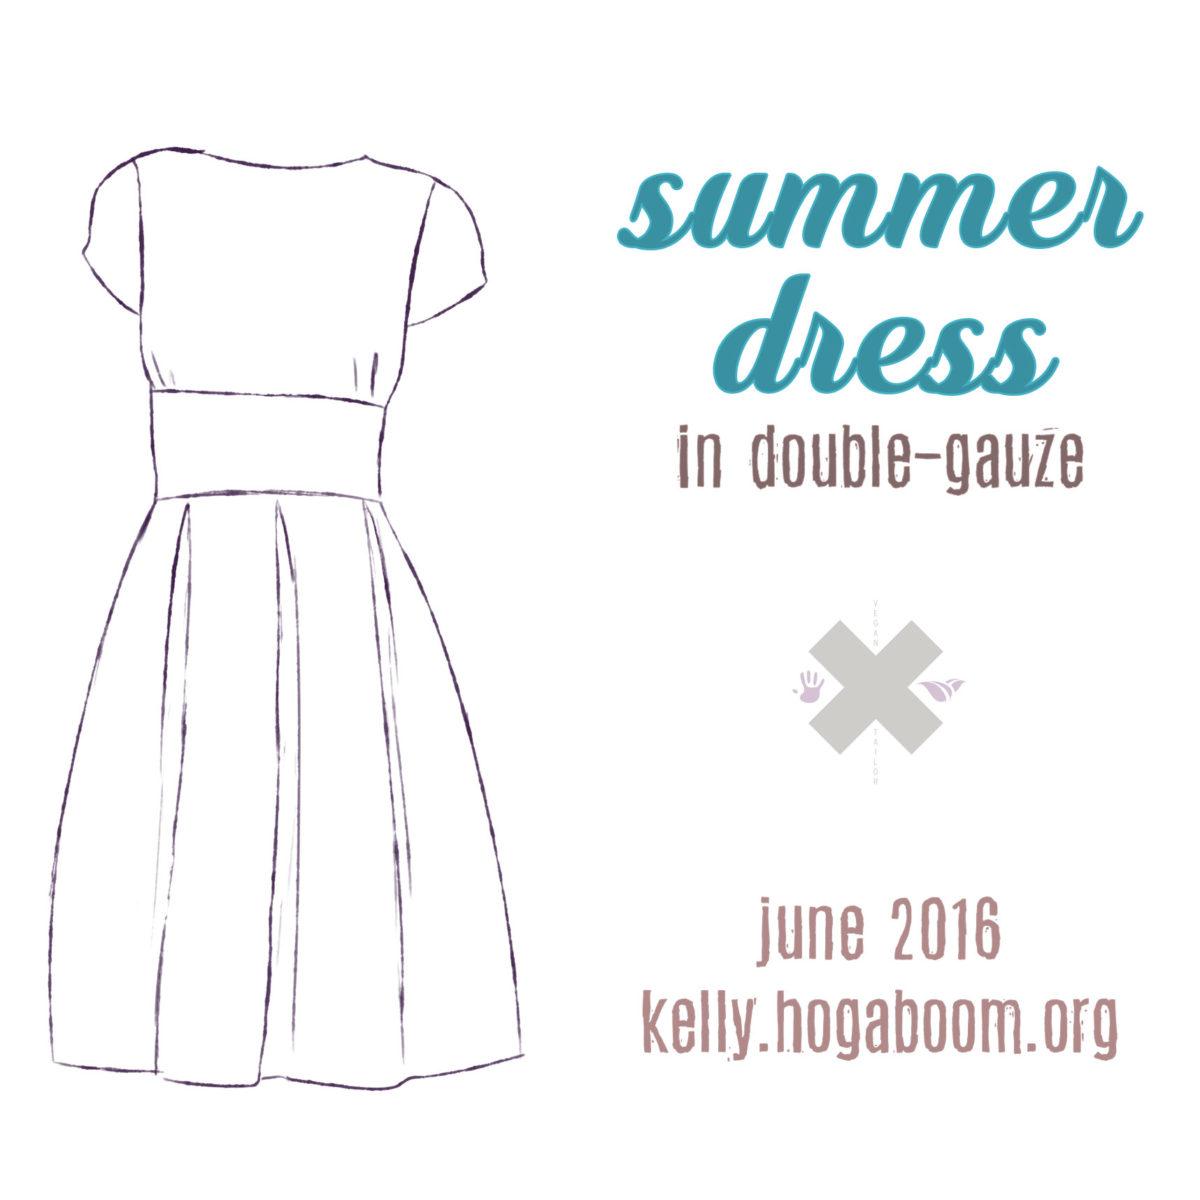 summer-dress-in-double-gauze-badge